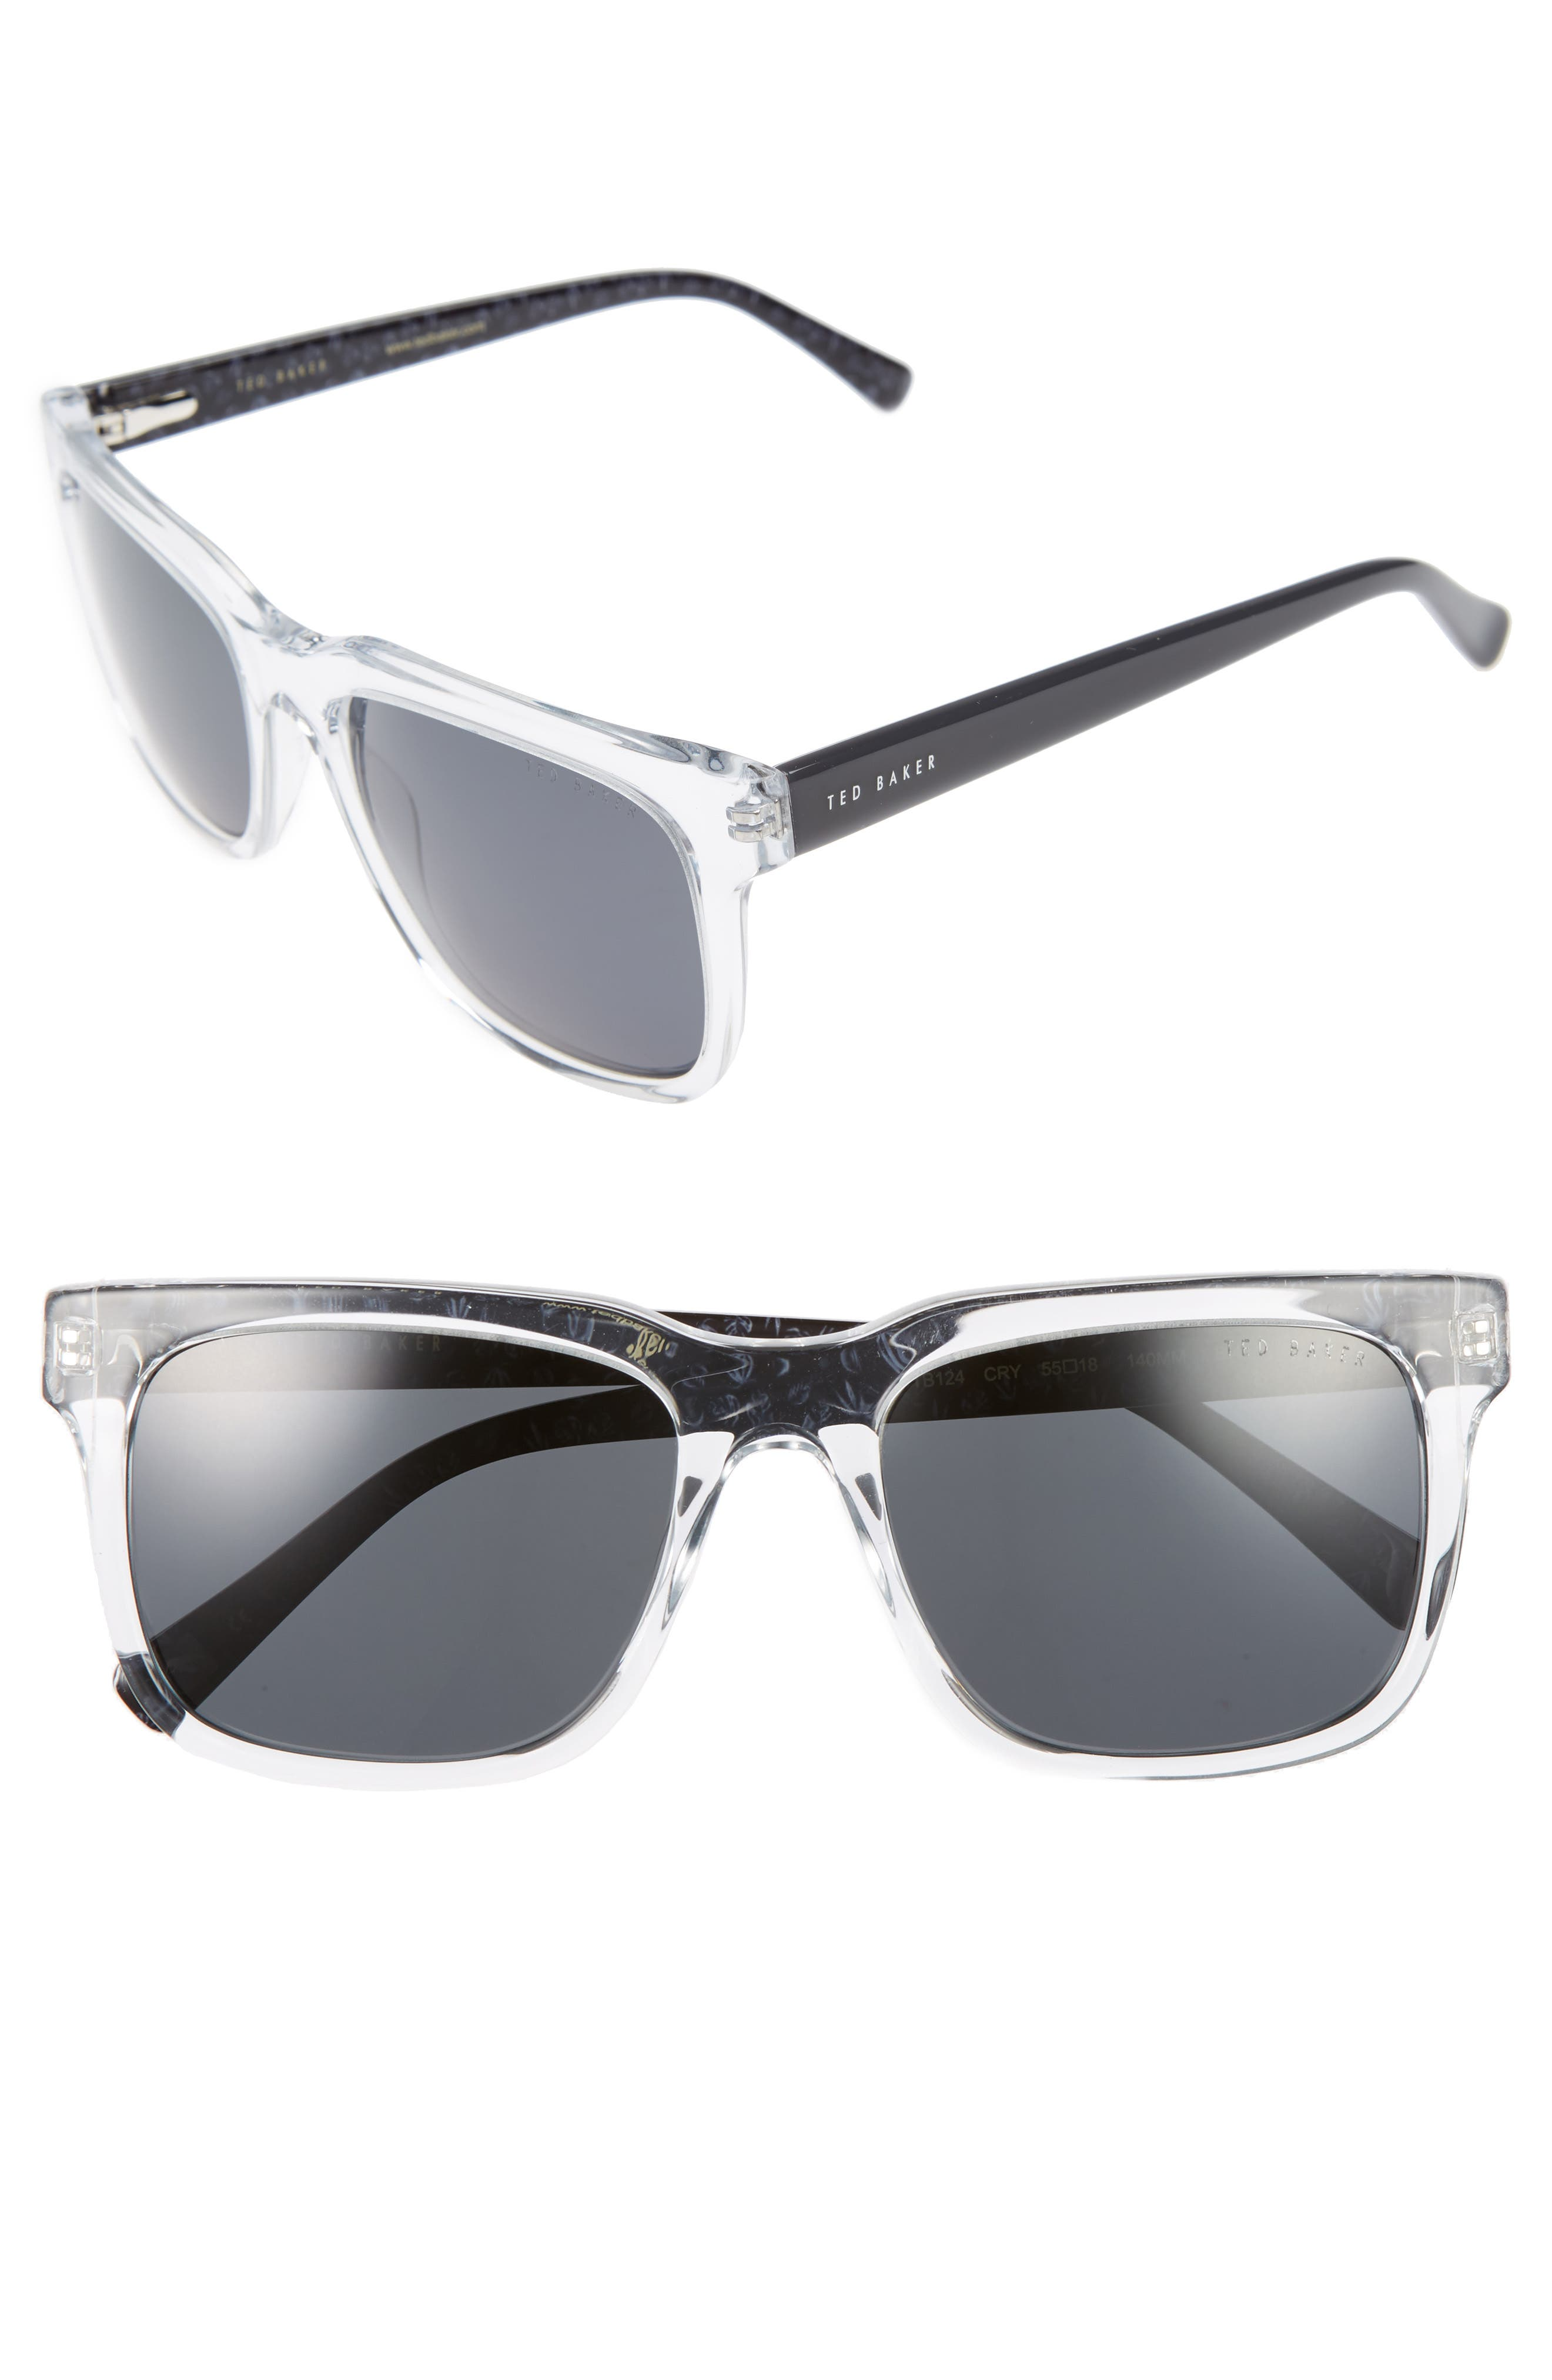 55mm Polarized Sunglasses,                             Main thumbnail 1, color,                             Crystal